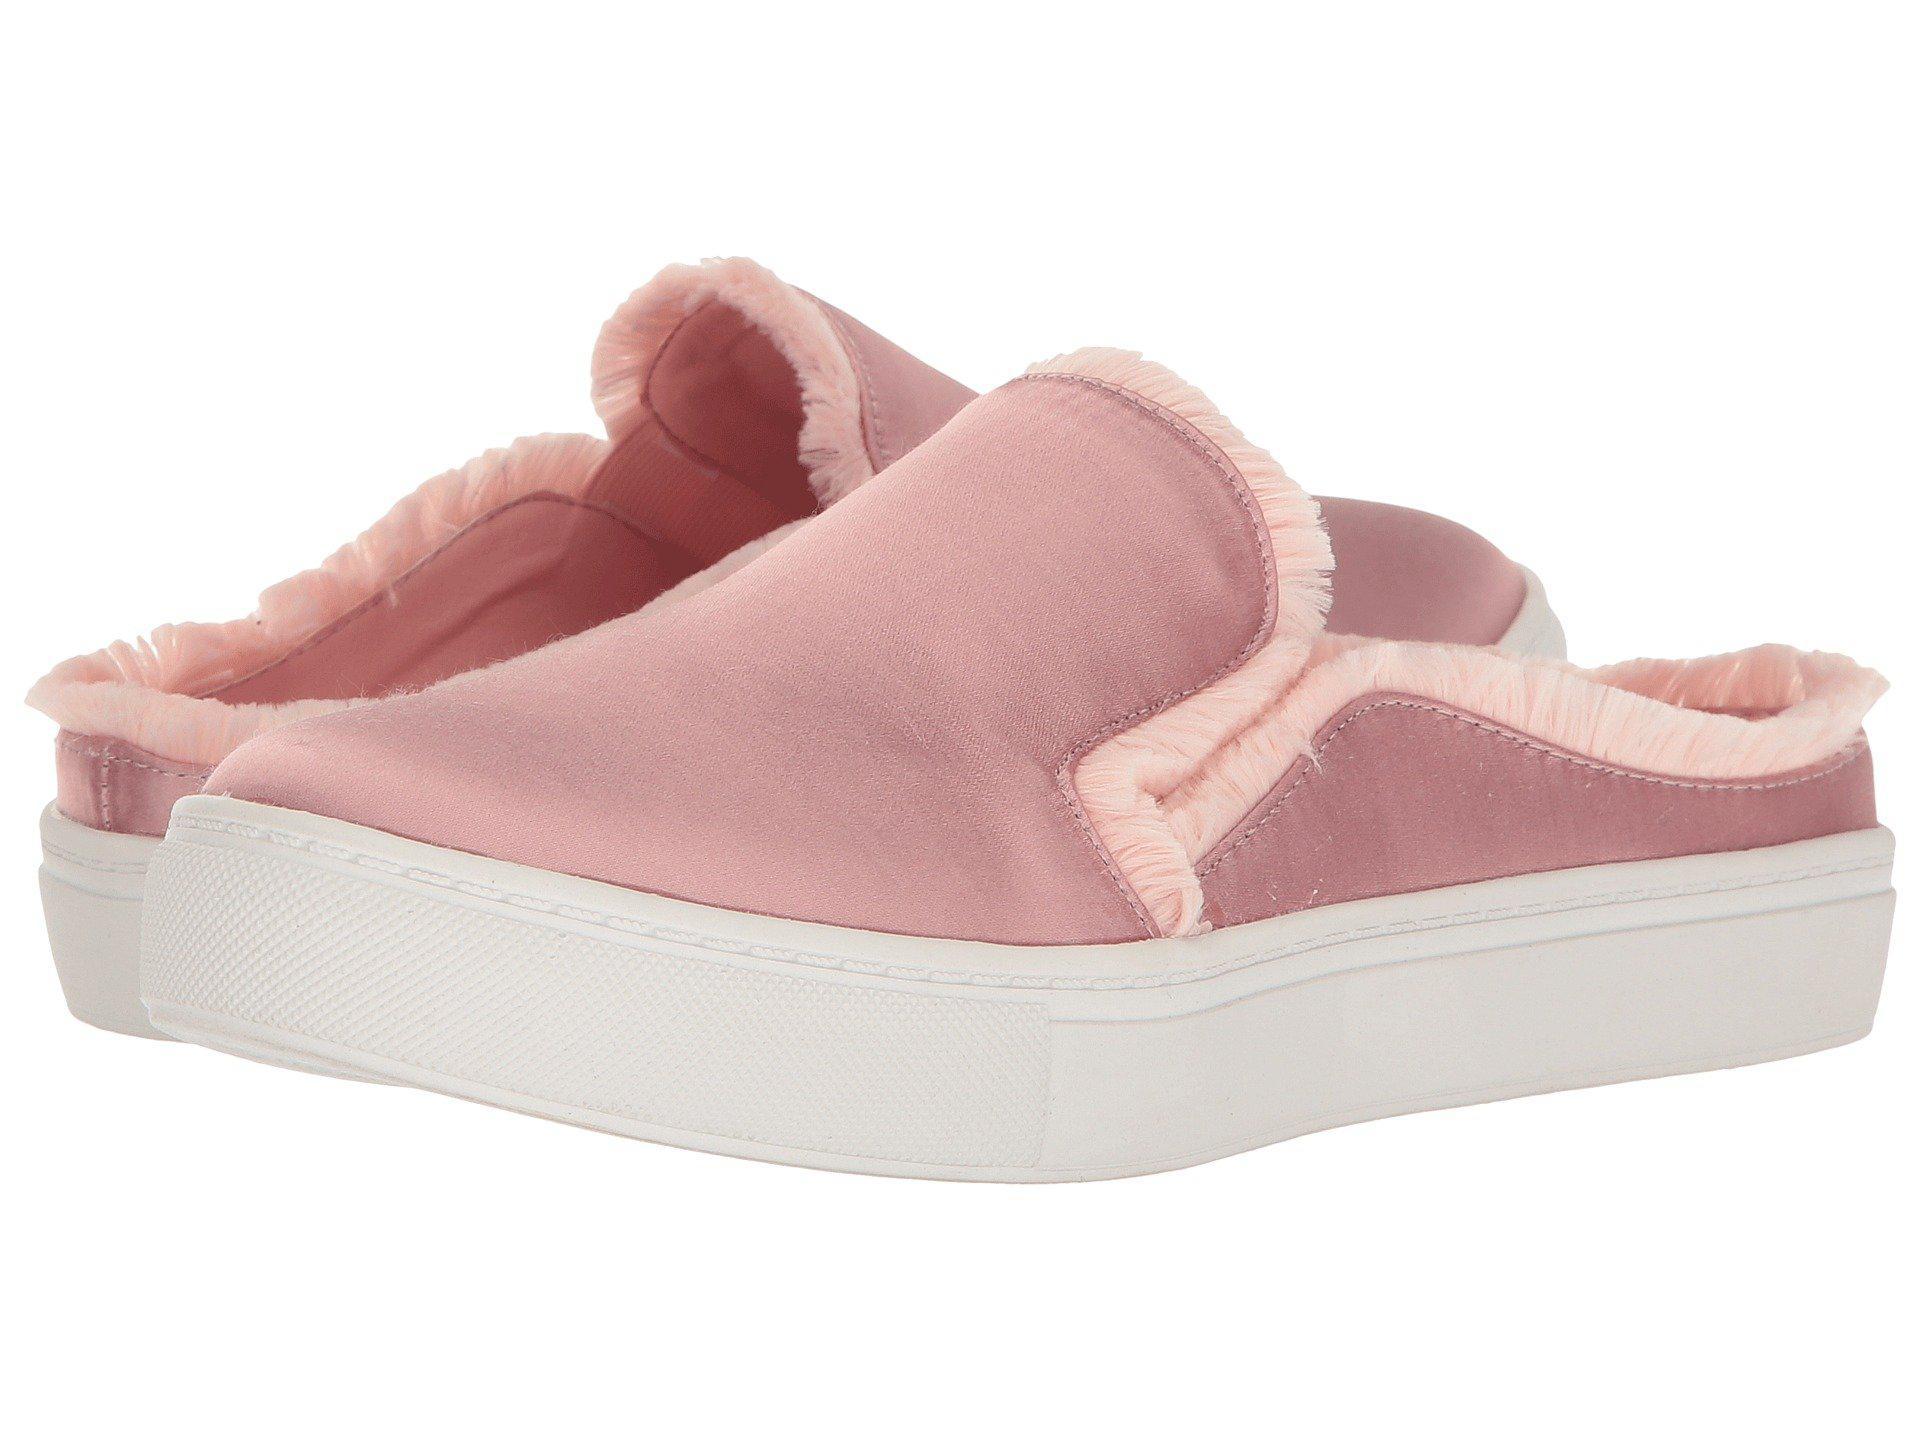 2c53d807fa6fa4 Lyst - Dirty Laundry Jaxon Satin Mule Sneaker in Pink - Save ...